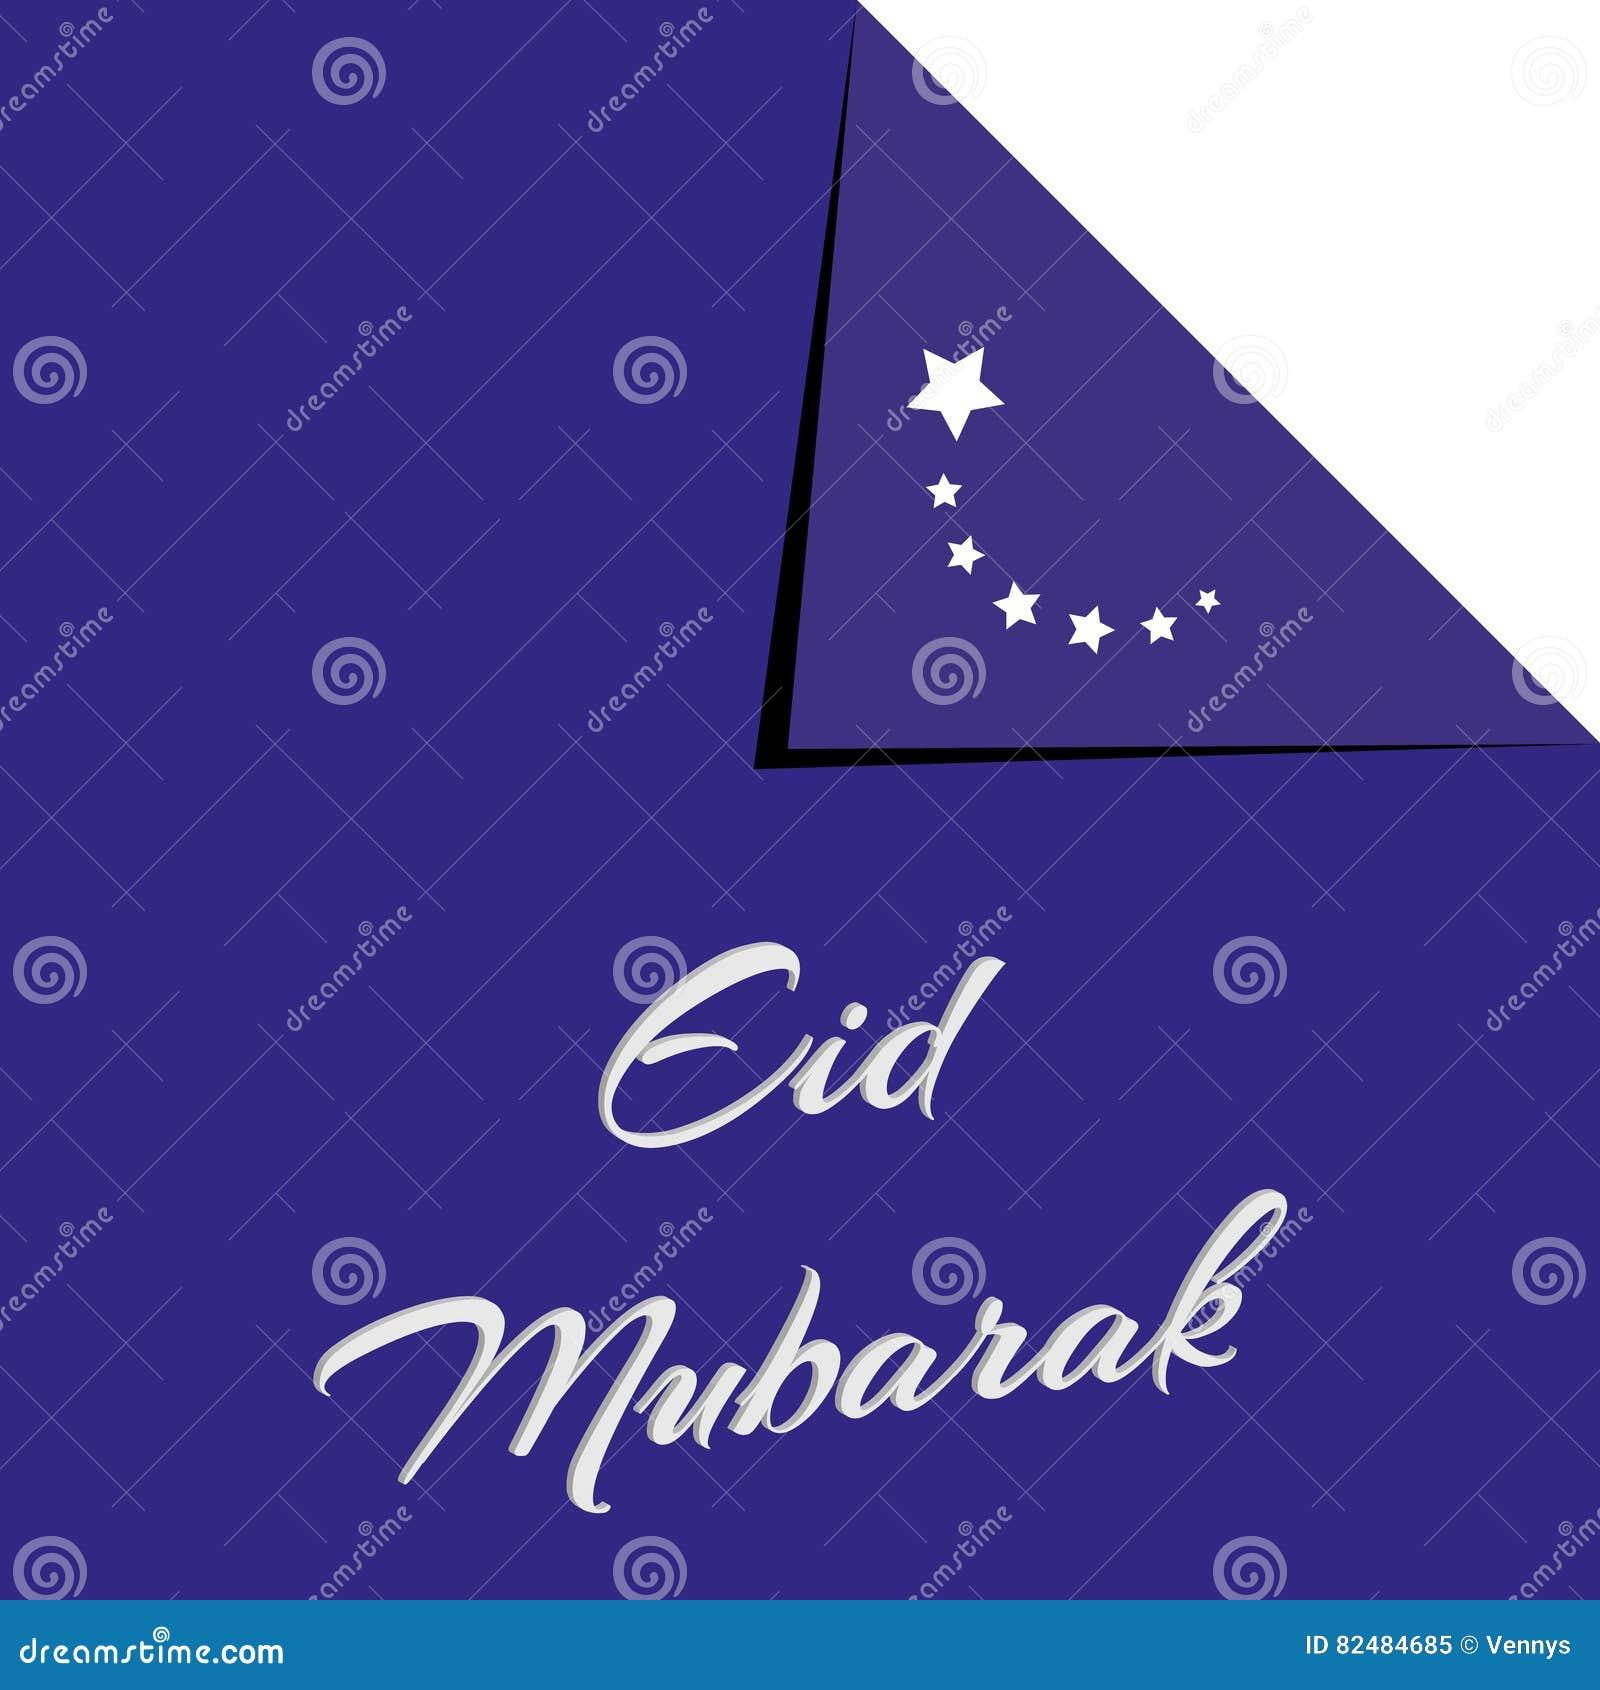 Eid mubarak traditional muslim greeting reserved for use on the download eid mubarak traditional muslim greeting reserved for use on the festivals greeting card m4hsunfo